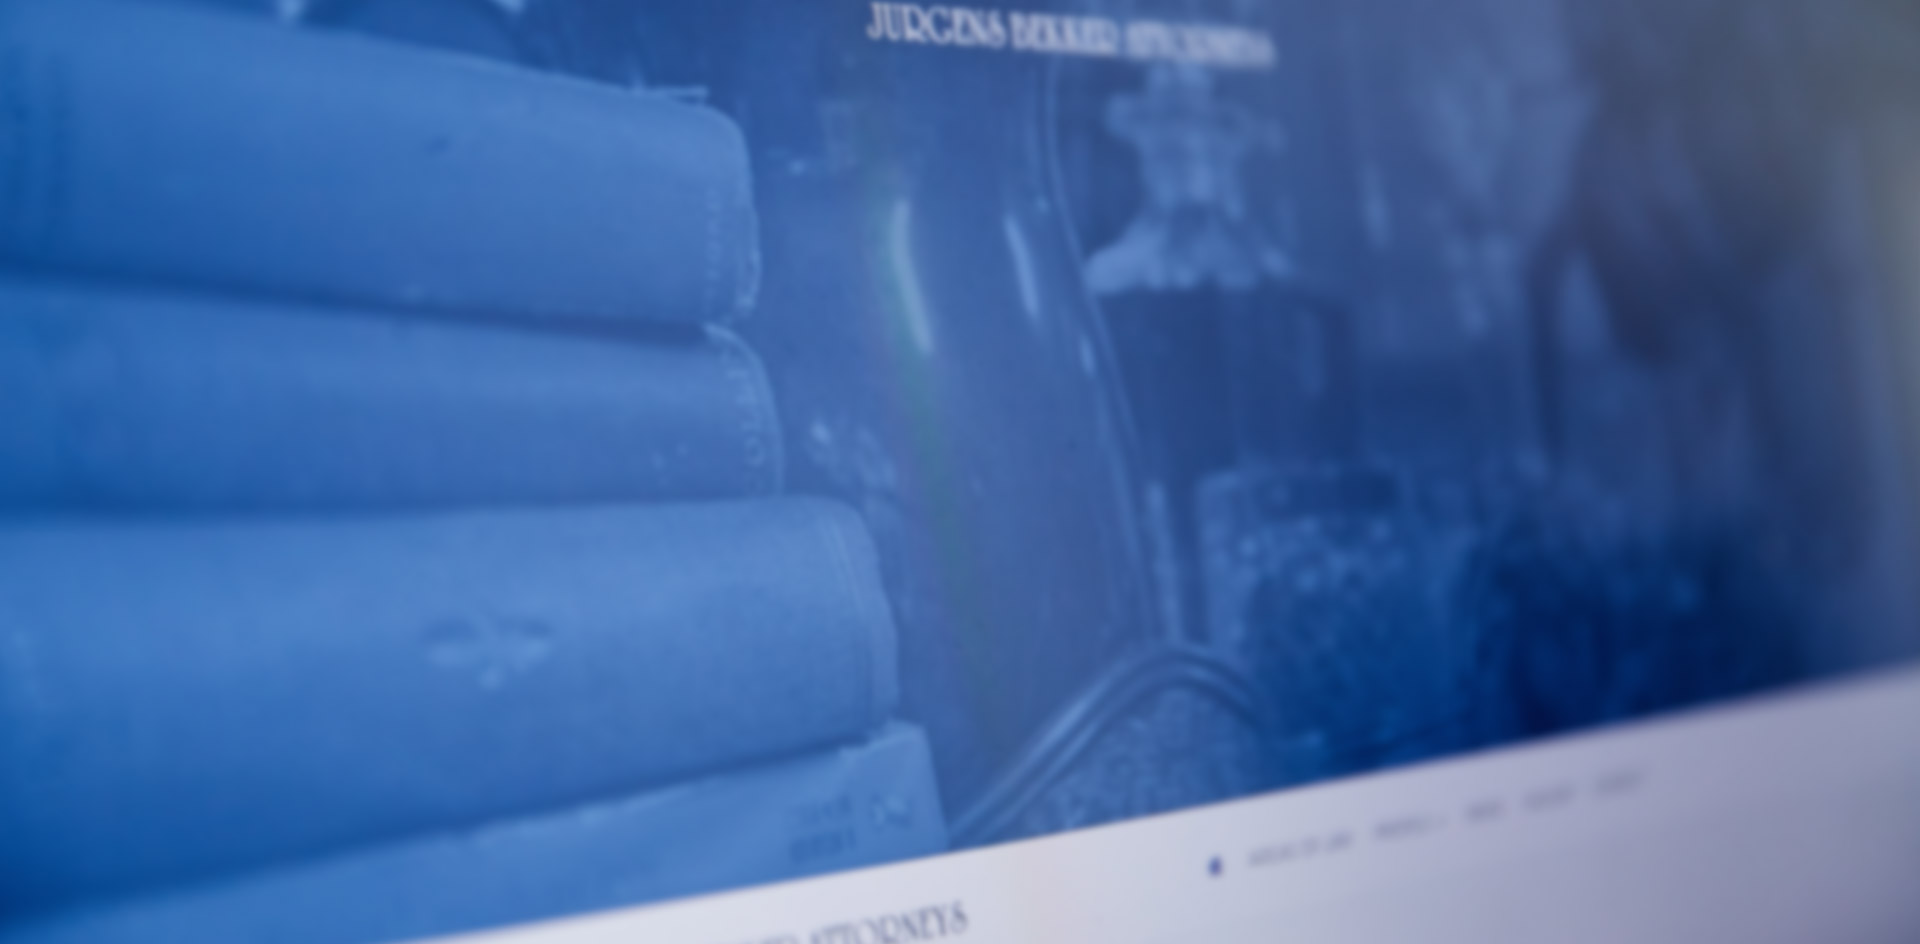 Jurgens Bekker Attorneys Web Design & Photography by Black Rooster Studios